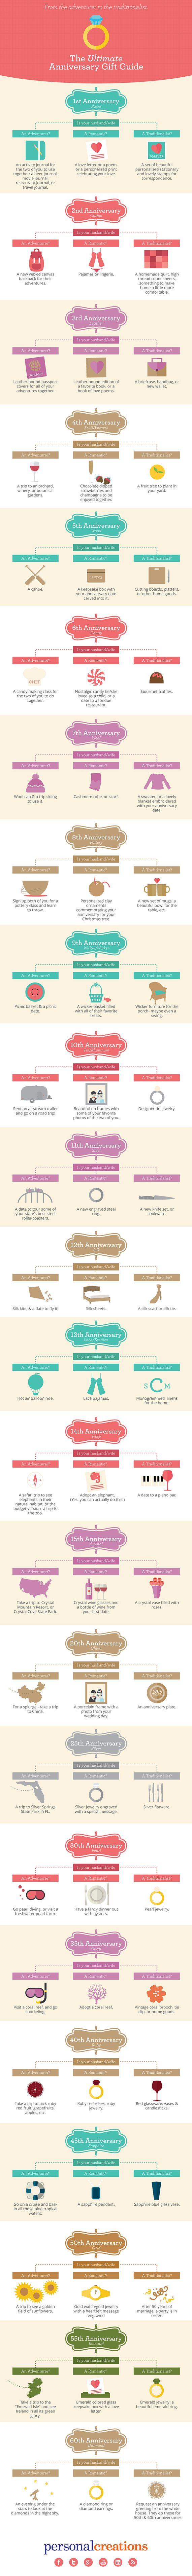 ... anniversary wedding anniversary gifts 2nd anniversary gift ideas for